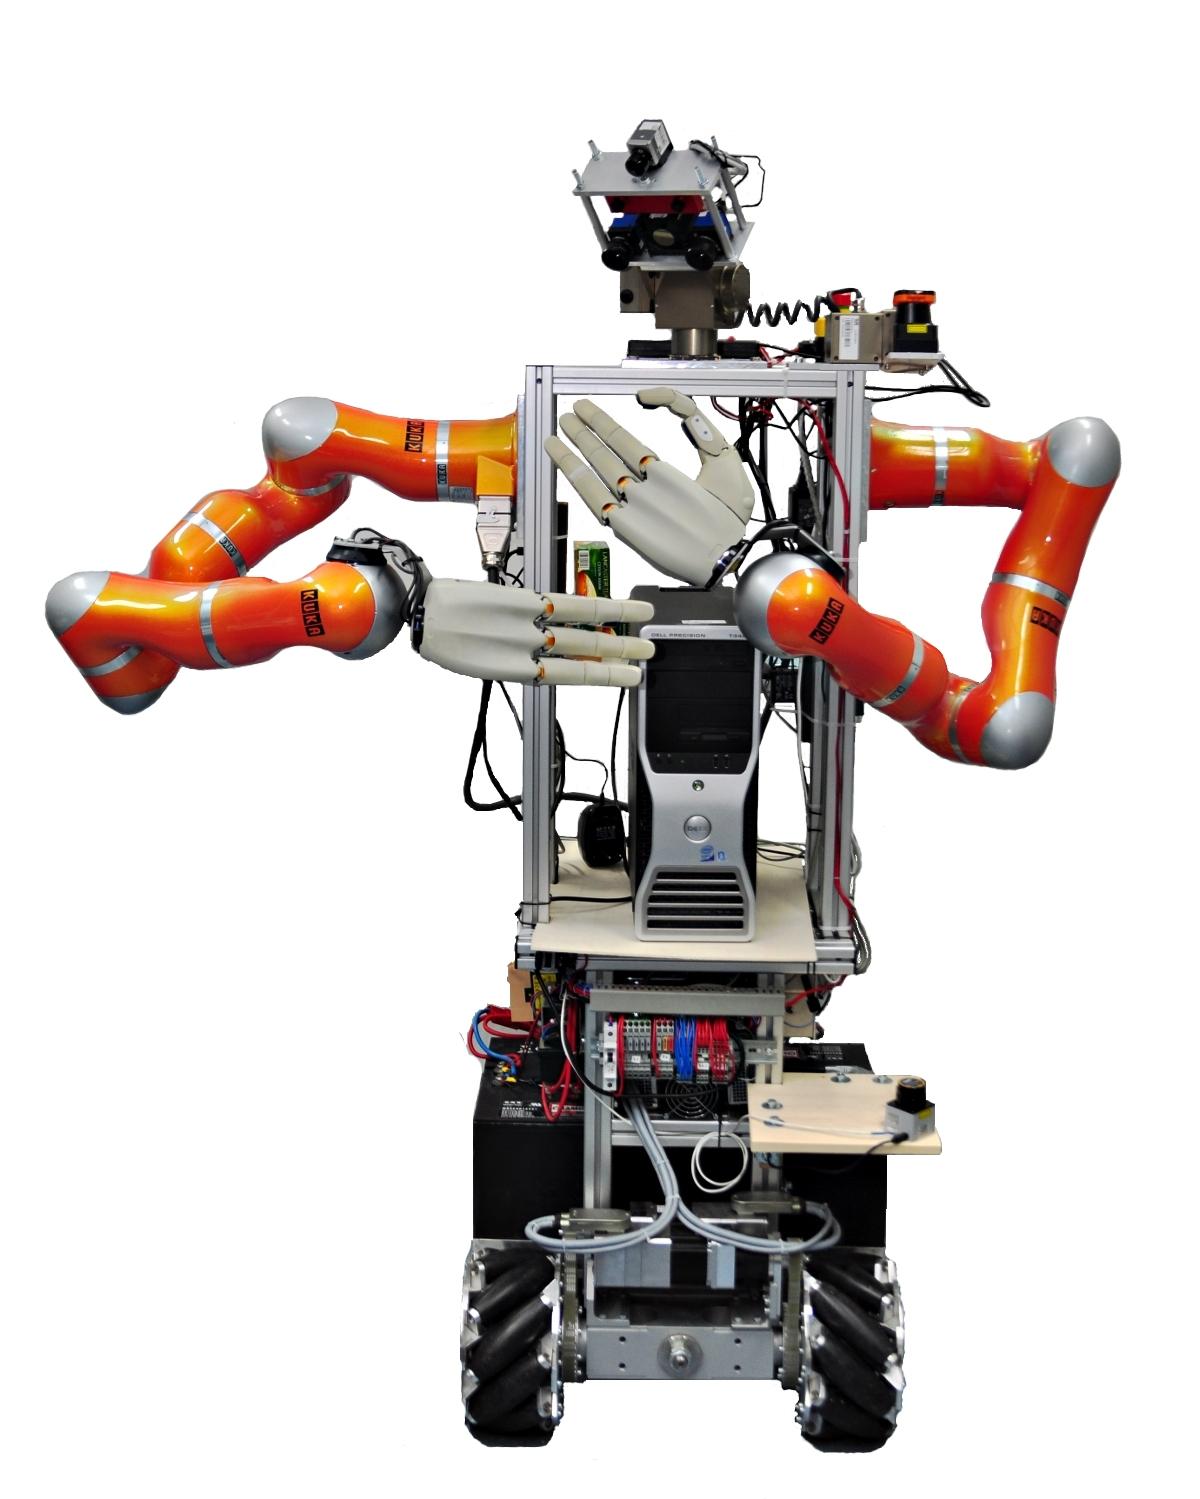 tum-ias-robot.jpg